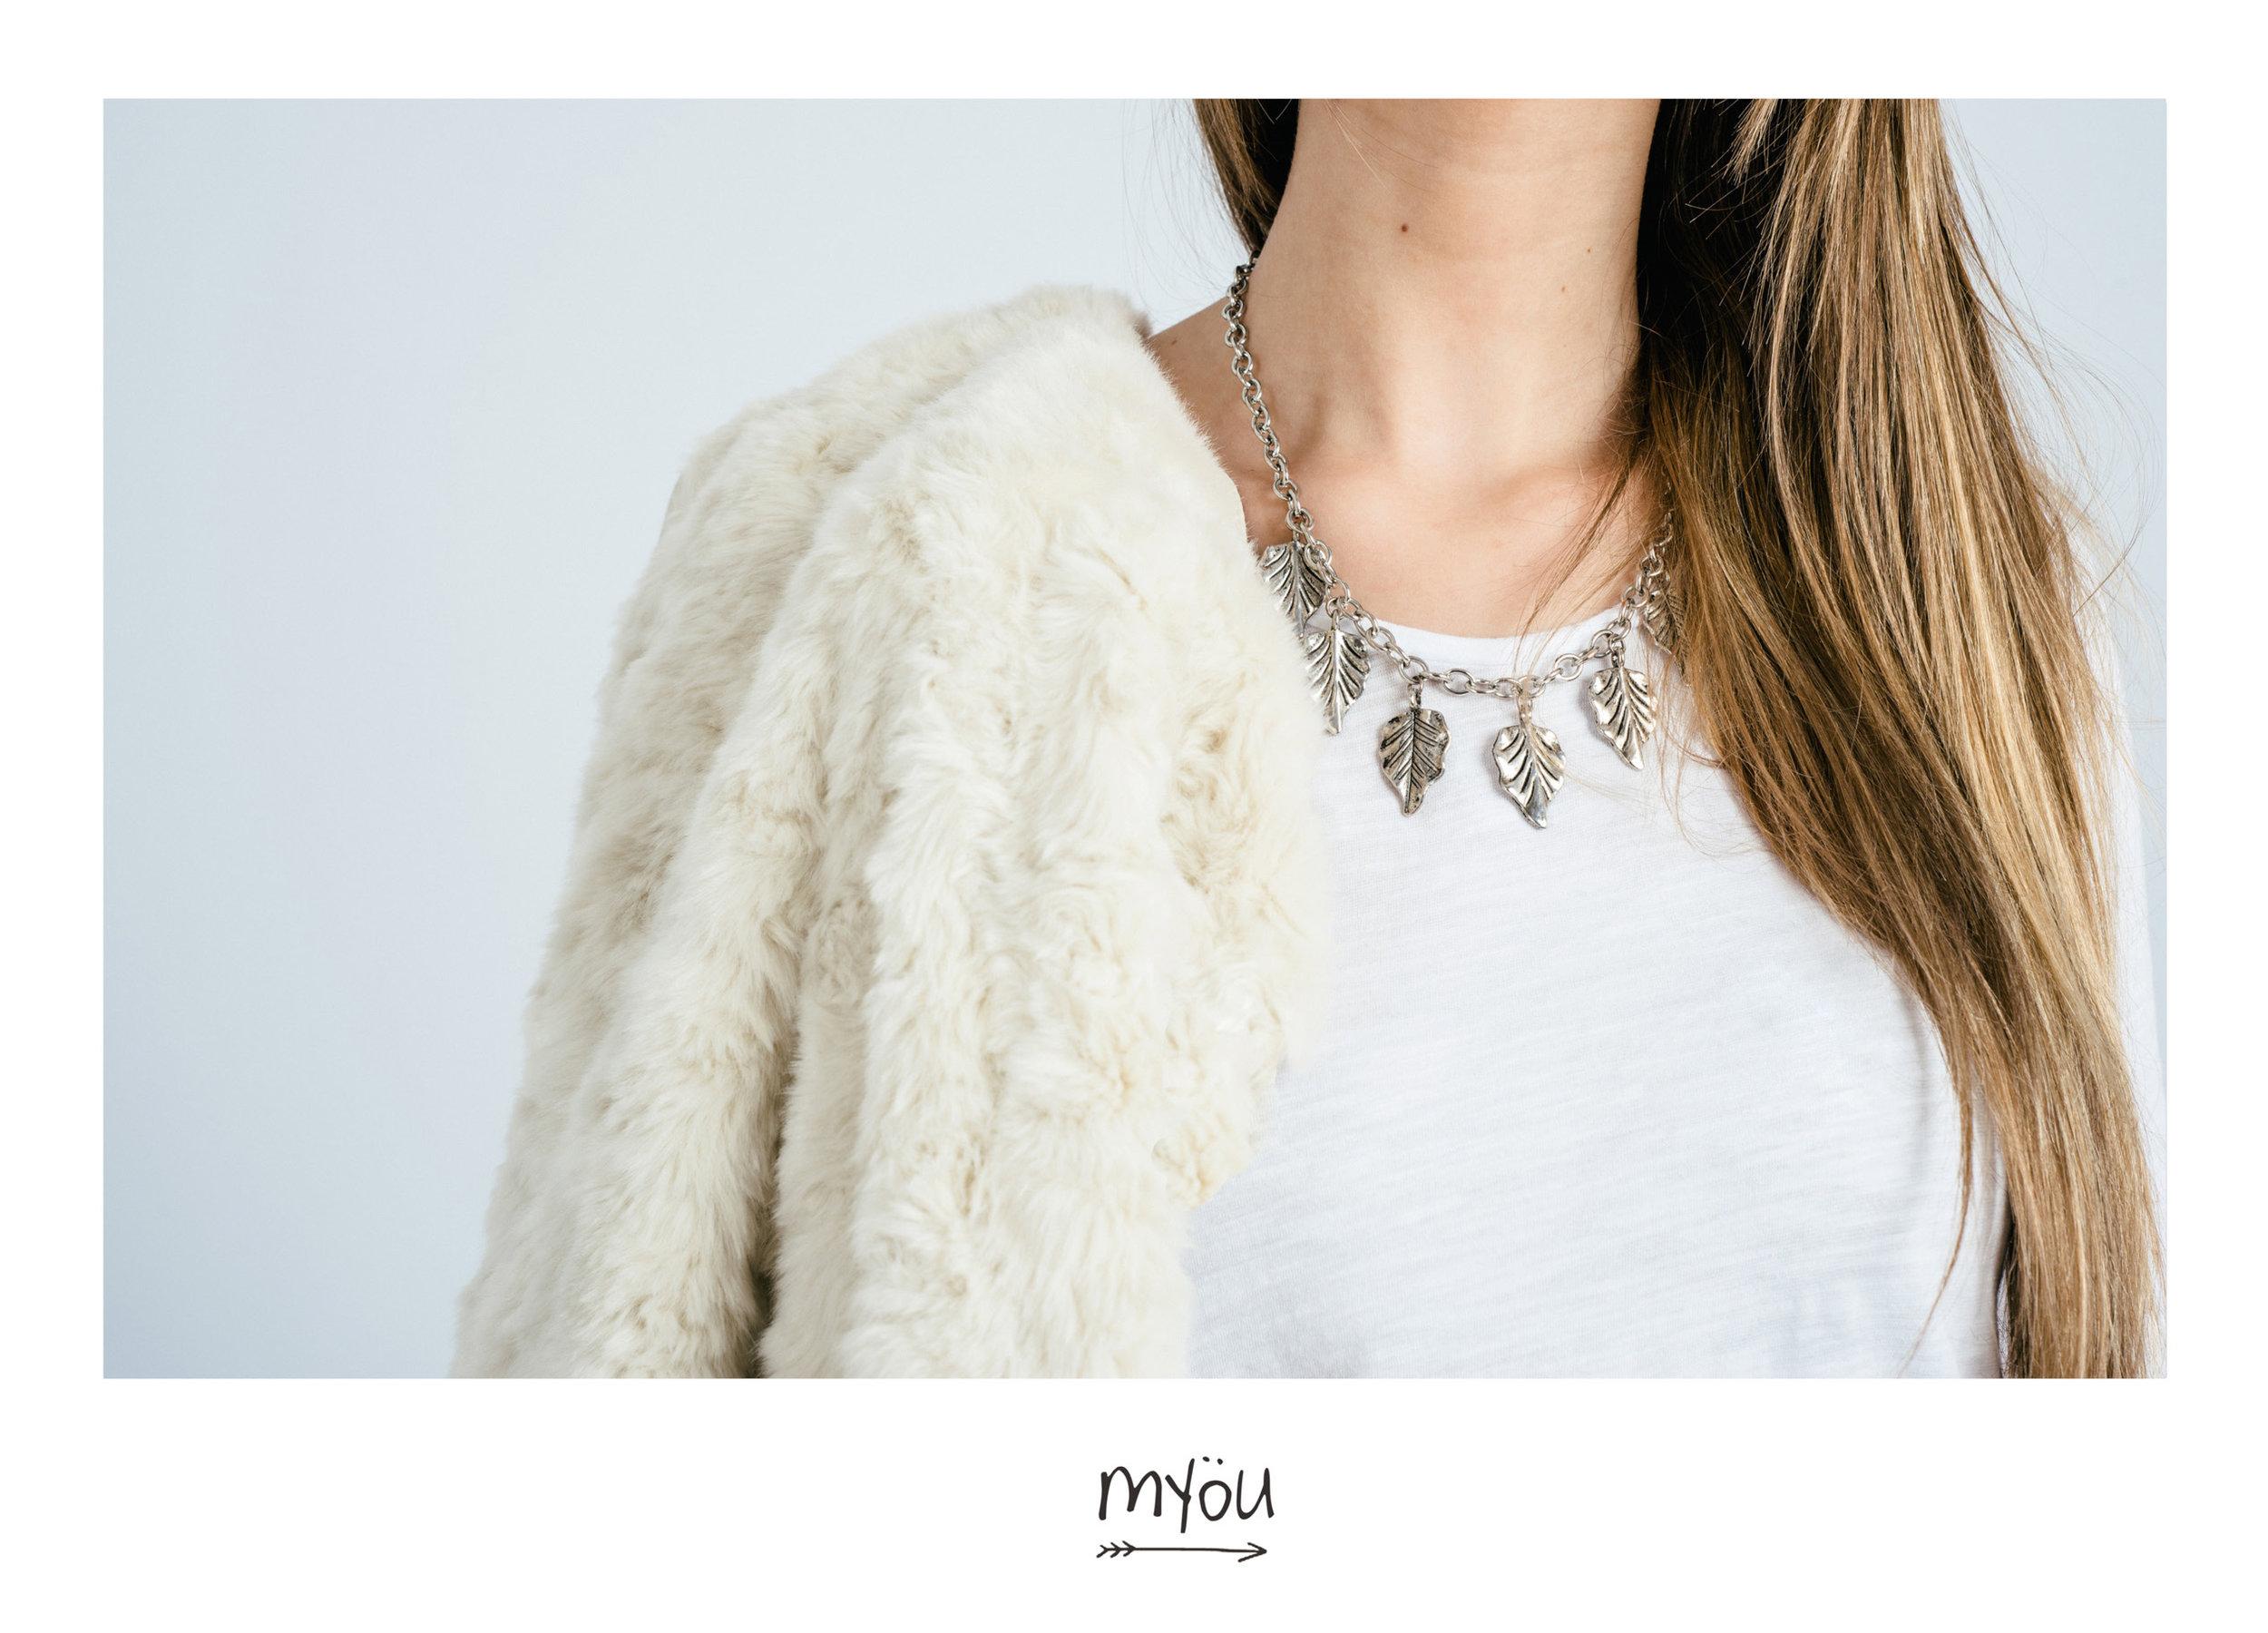 Myou4.jpg